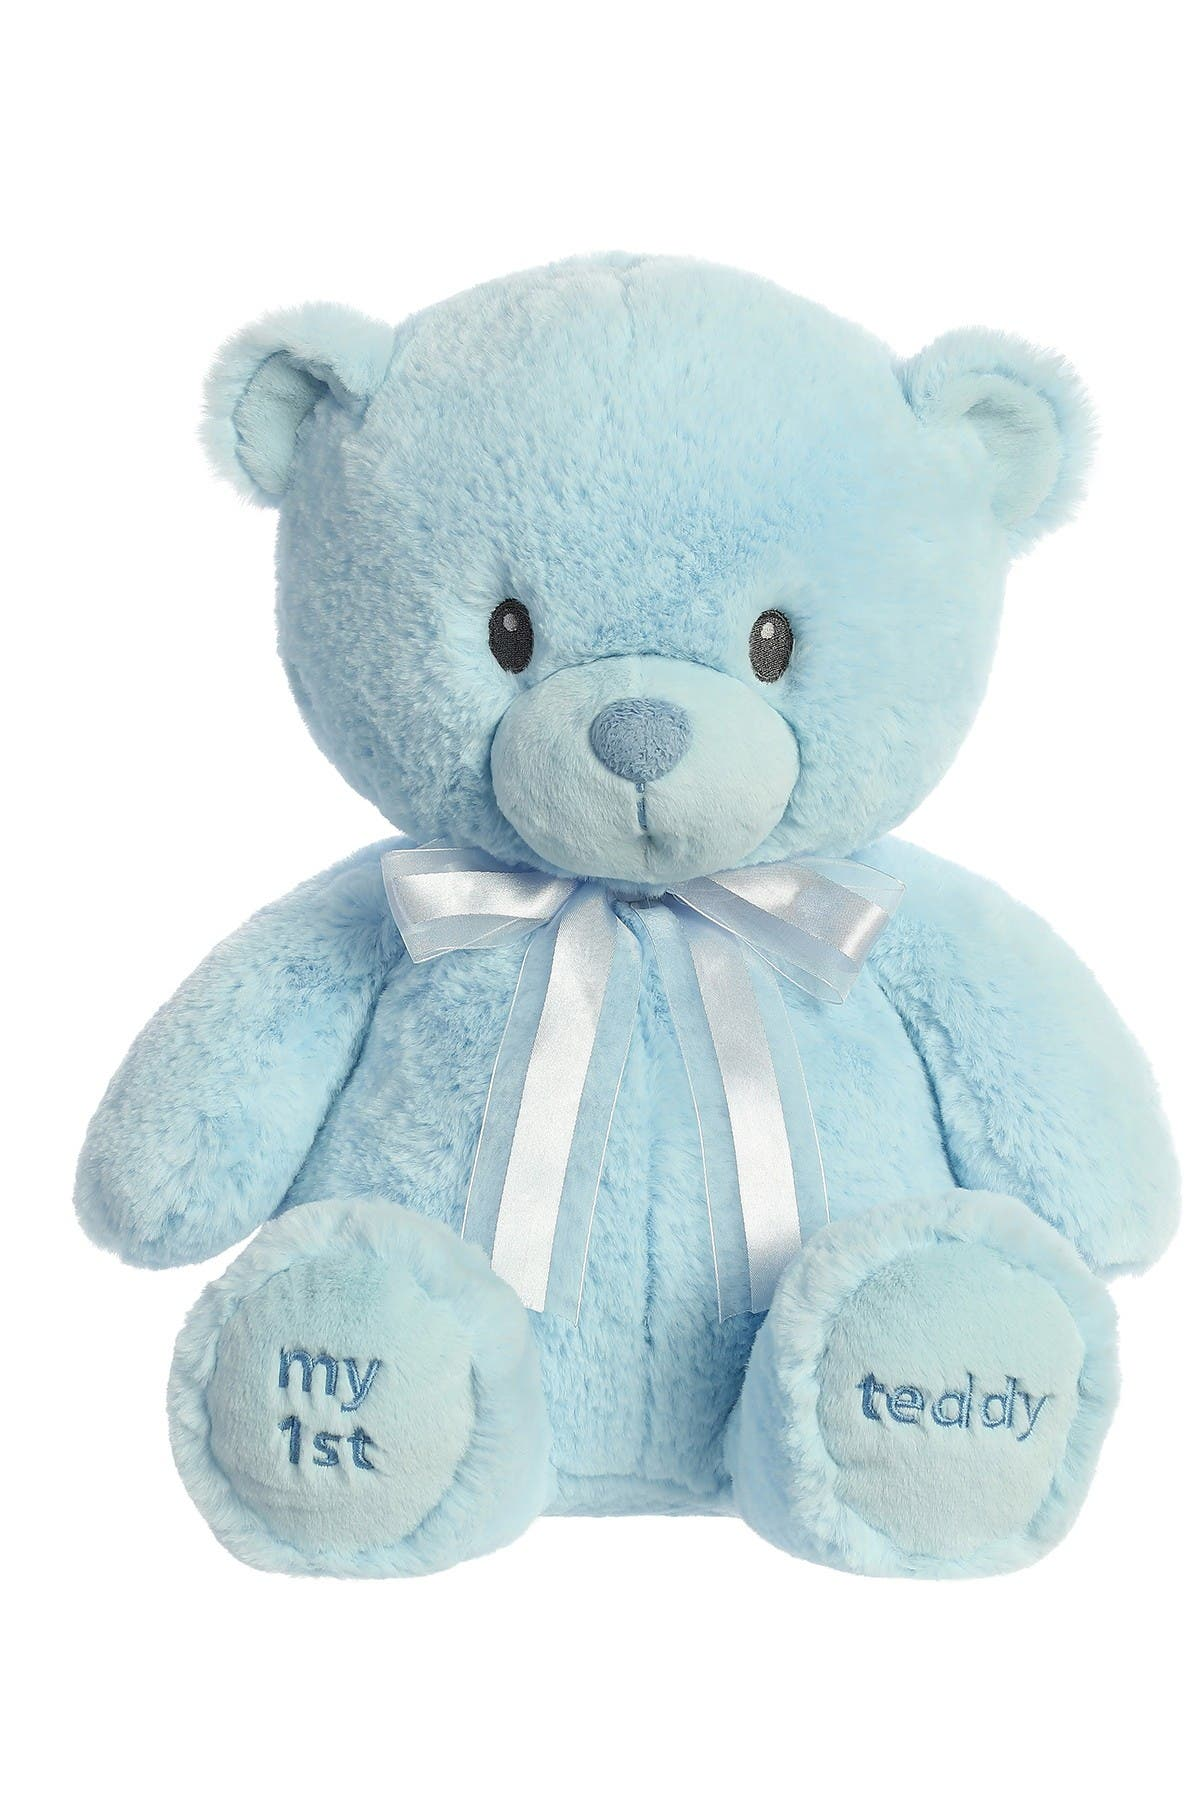 "Image of Aurora World Toys 18"" My First Teddy - Blue Faux Fur"